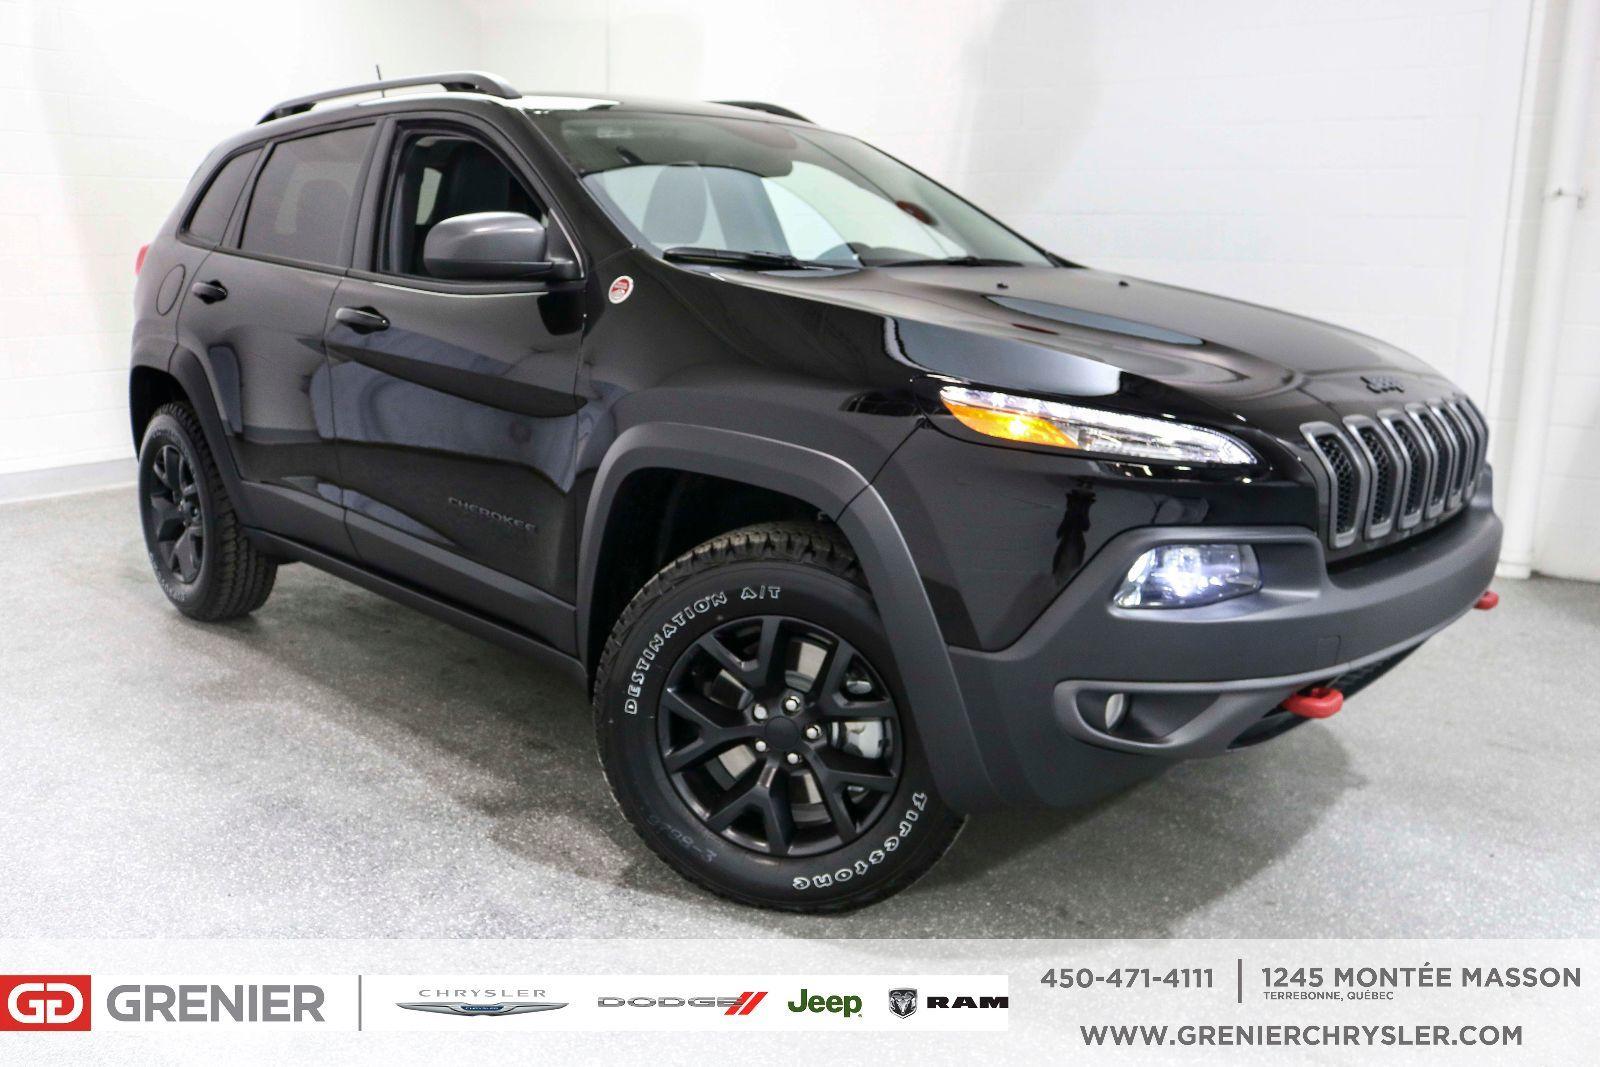 New 2018 Jeep Cherokee Trailhawk / crochet remorquage / rétro chauffant Black - $37350.0 ...